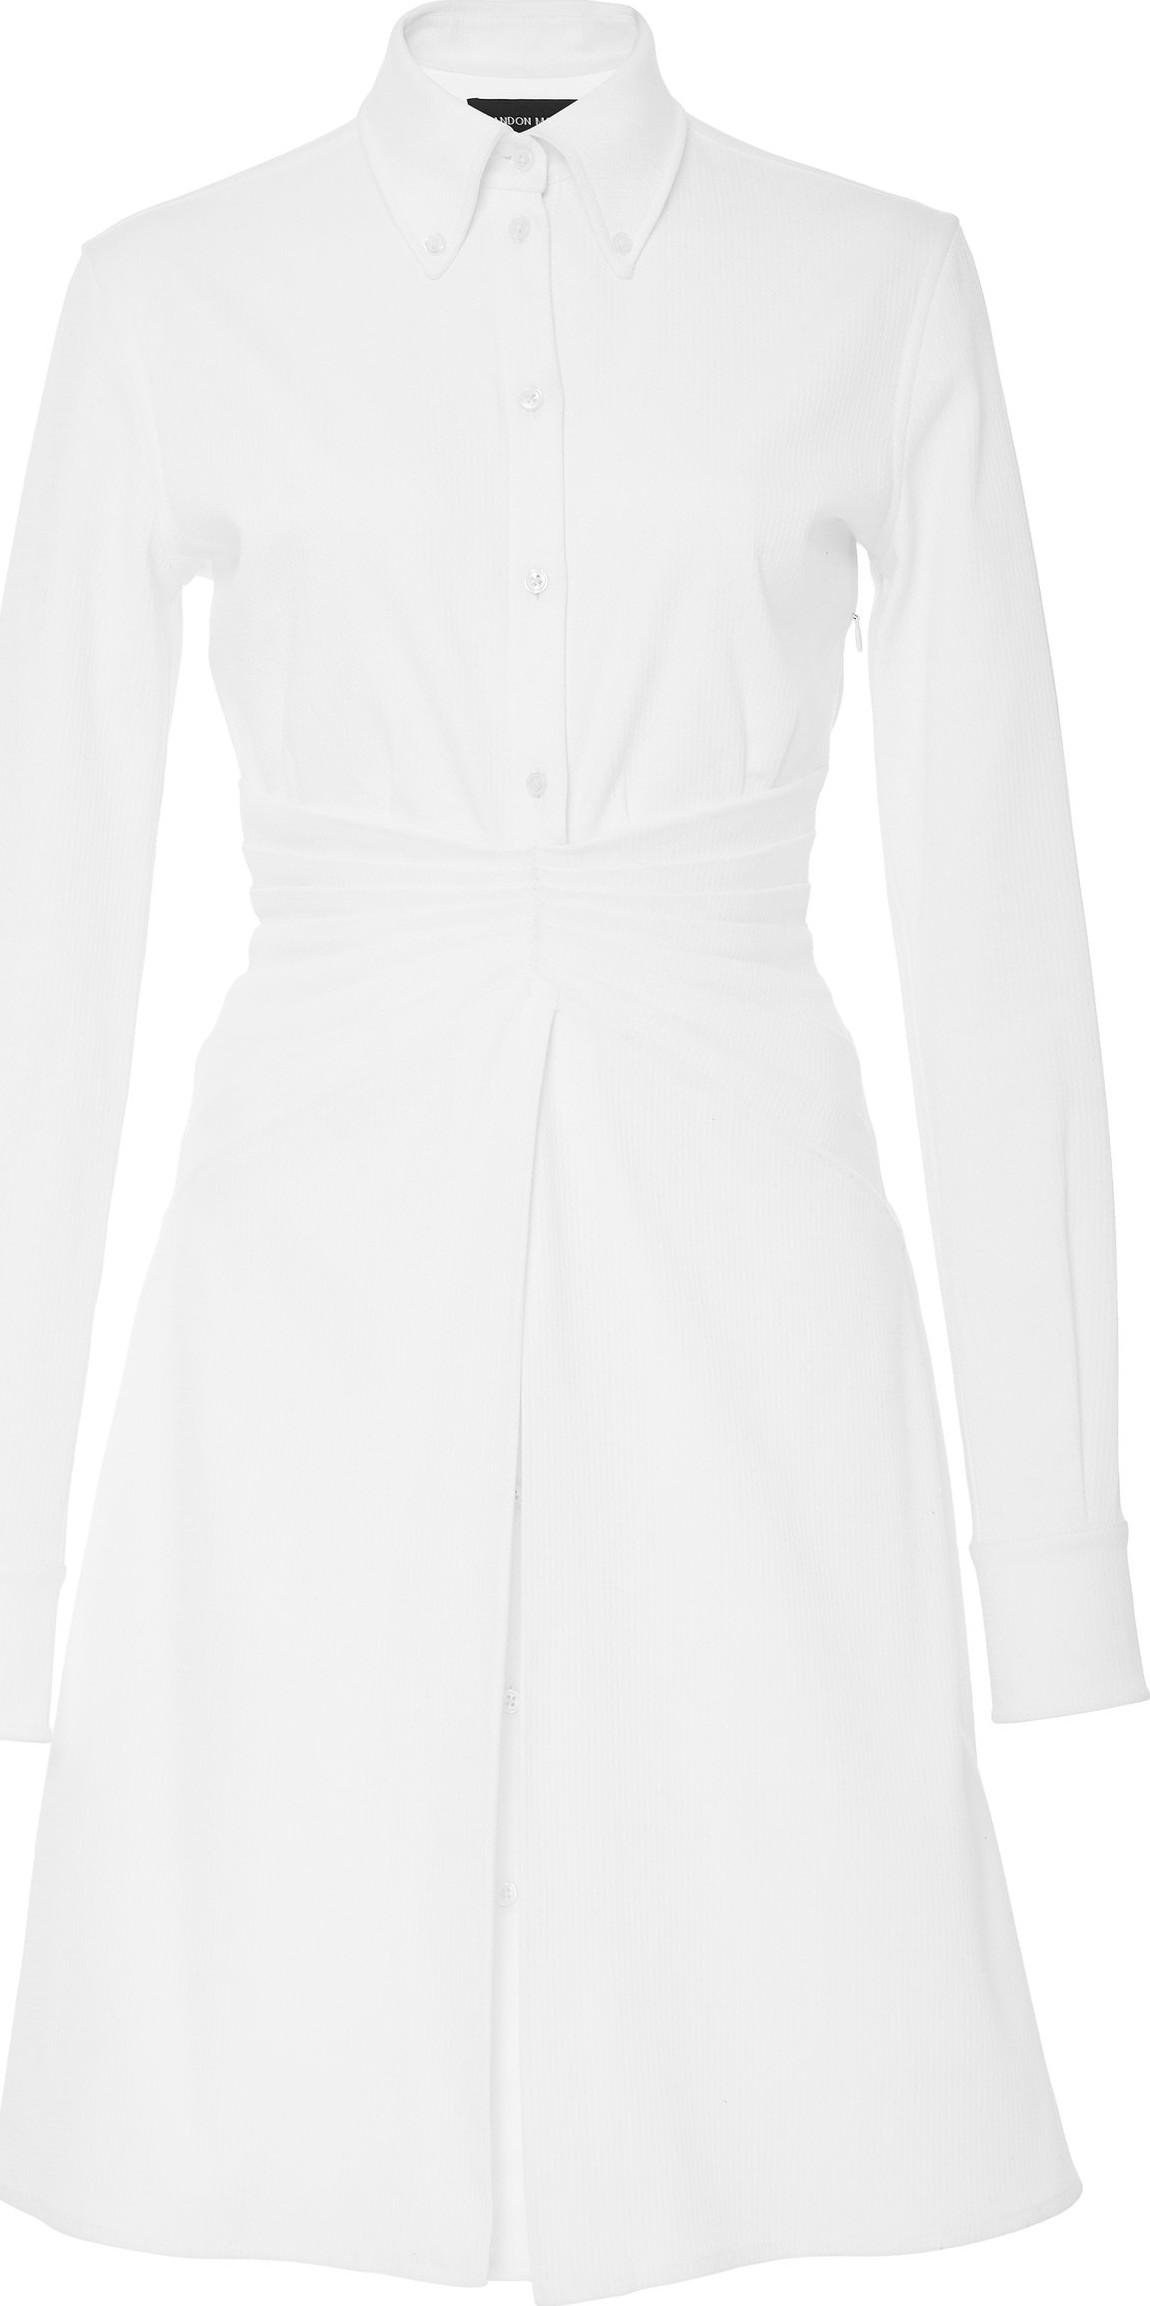 abe450fef42 Brandon Maxwell Mirror Pleat Shirt Dress - Mkt